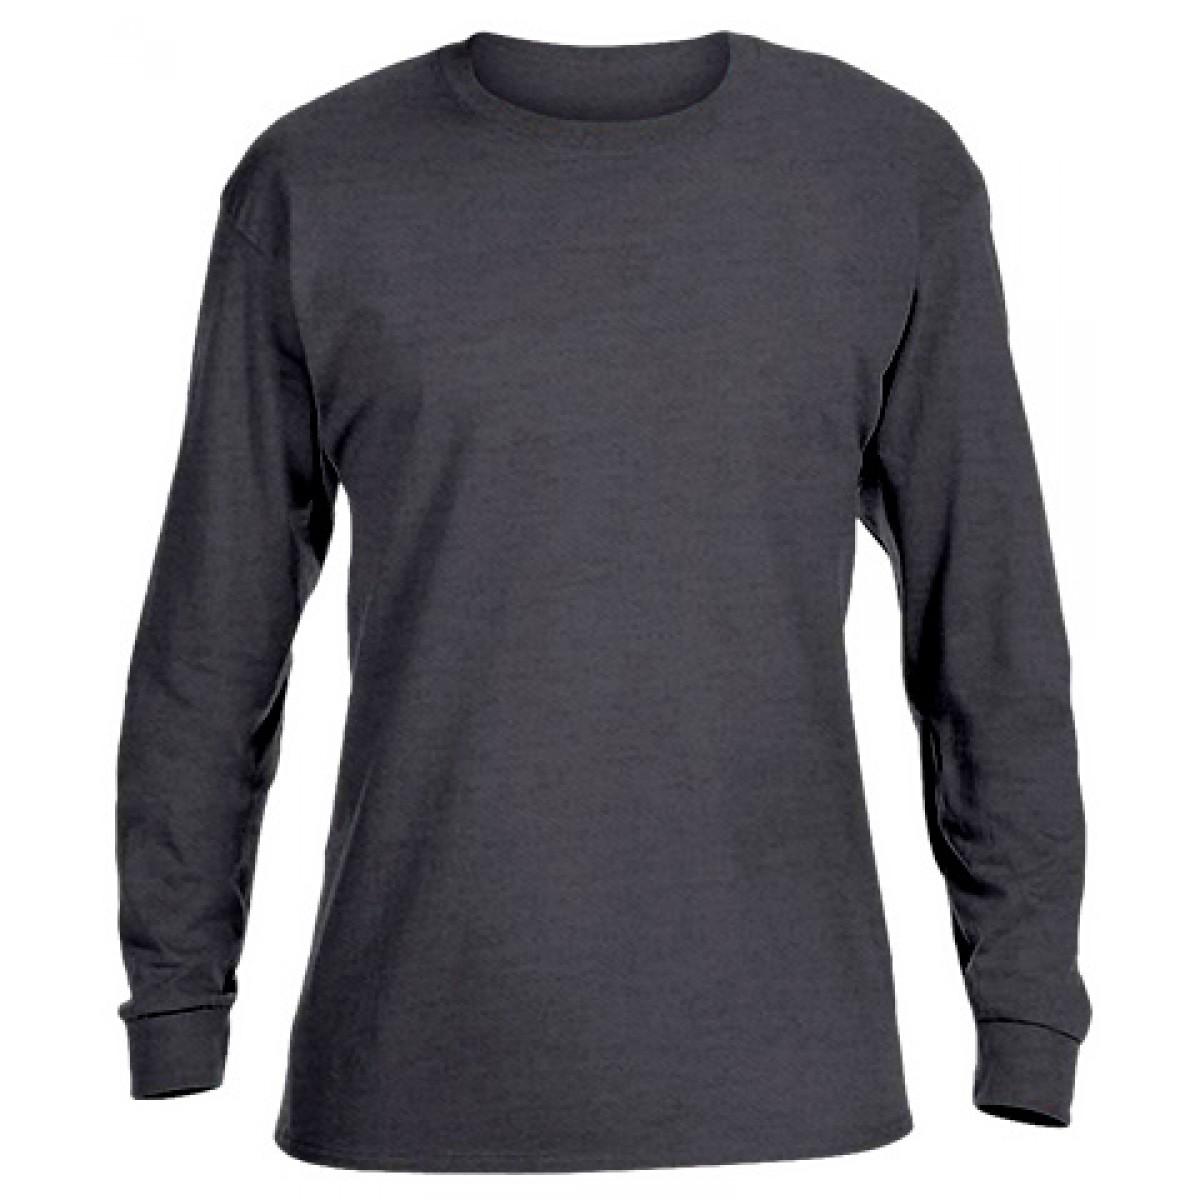 Ultra Cotton Long-Sleeve T-Shirt-Black-S